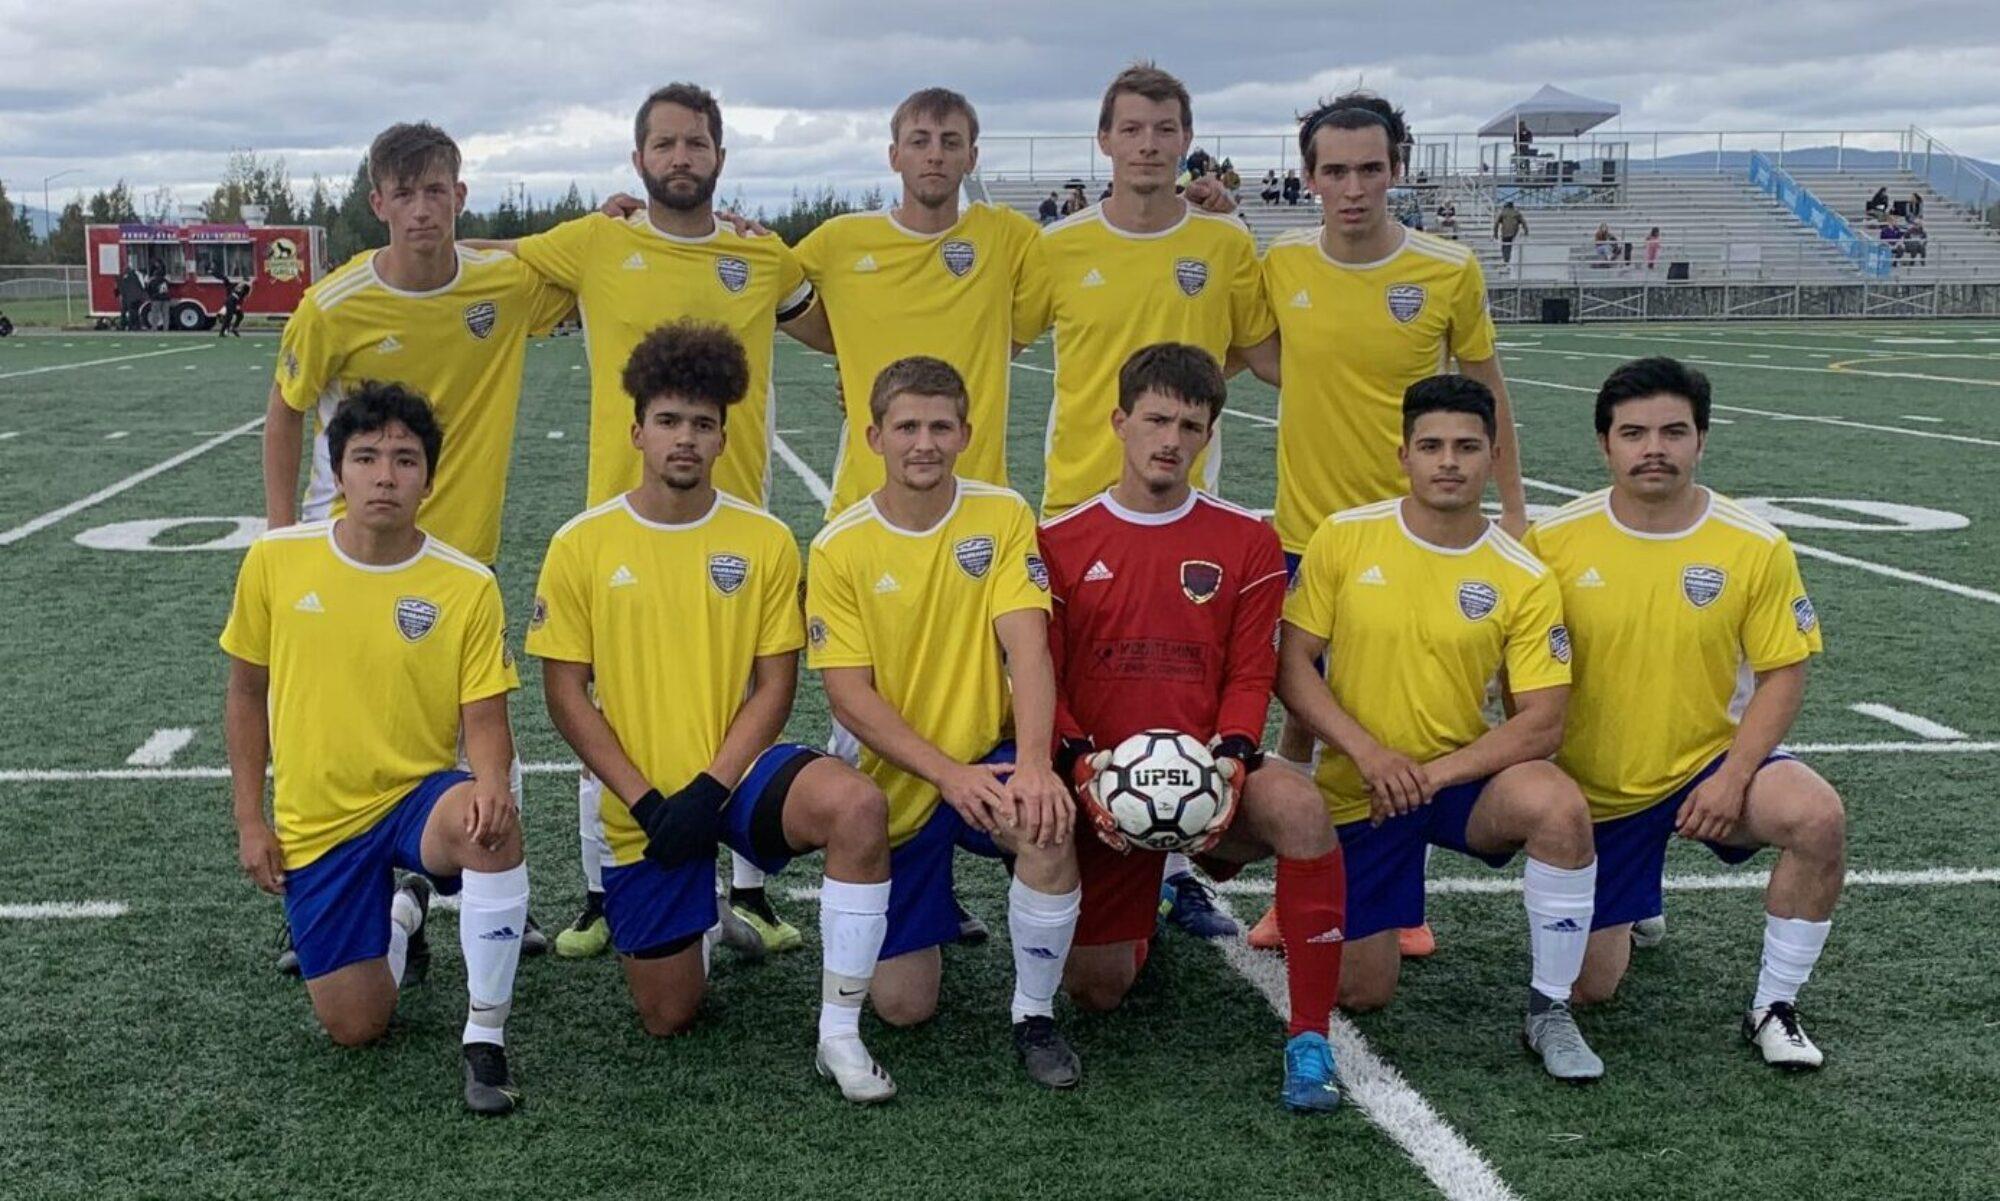 Fairbanks Soccer Club Website